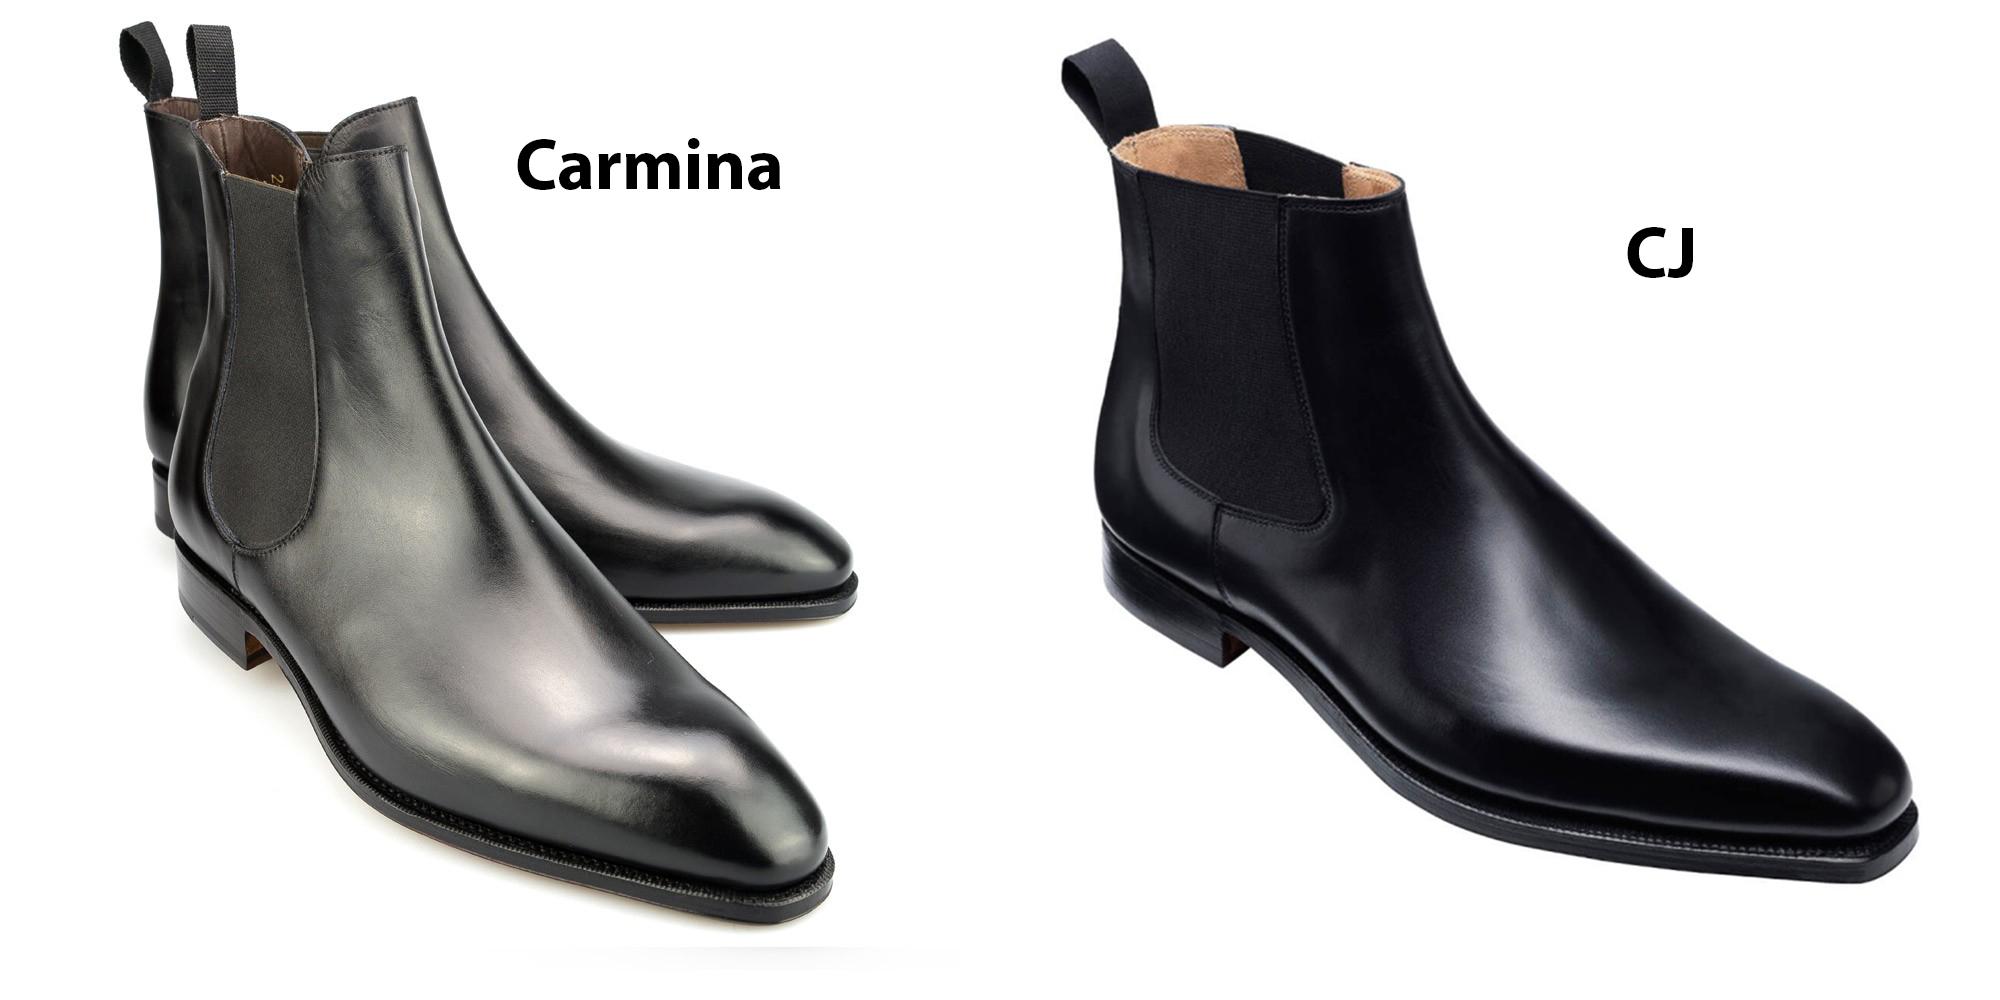 chelsea_boots_carmina_80216_l.jpg